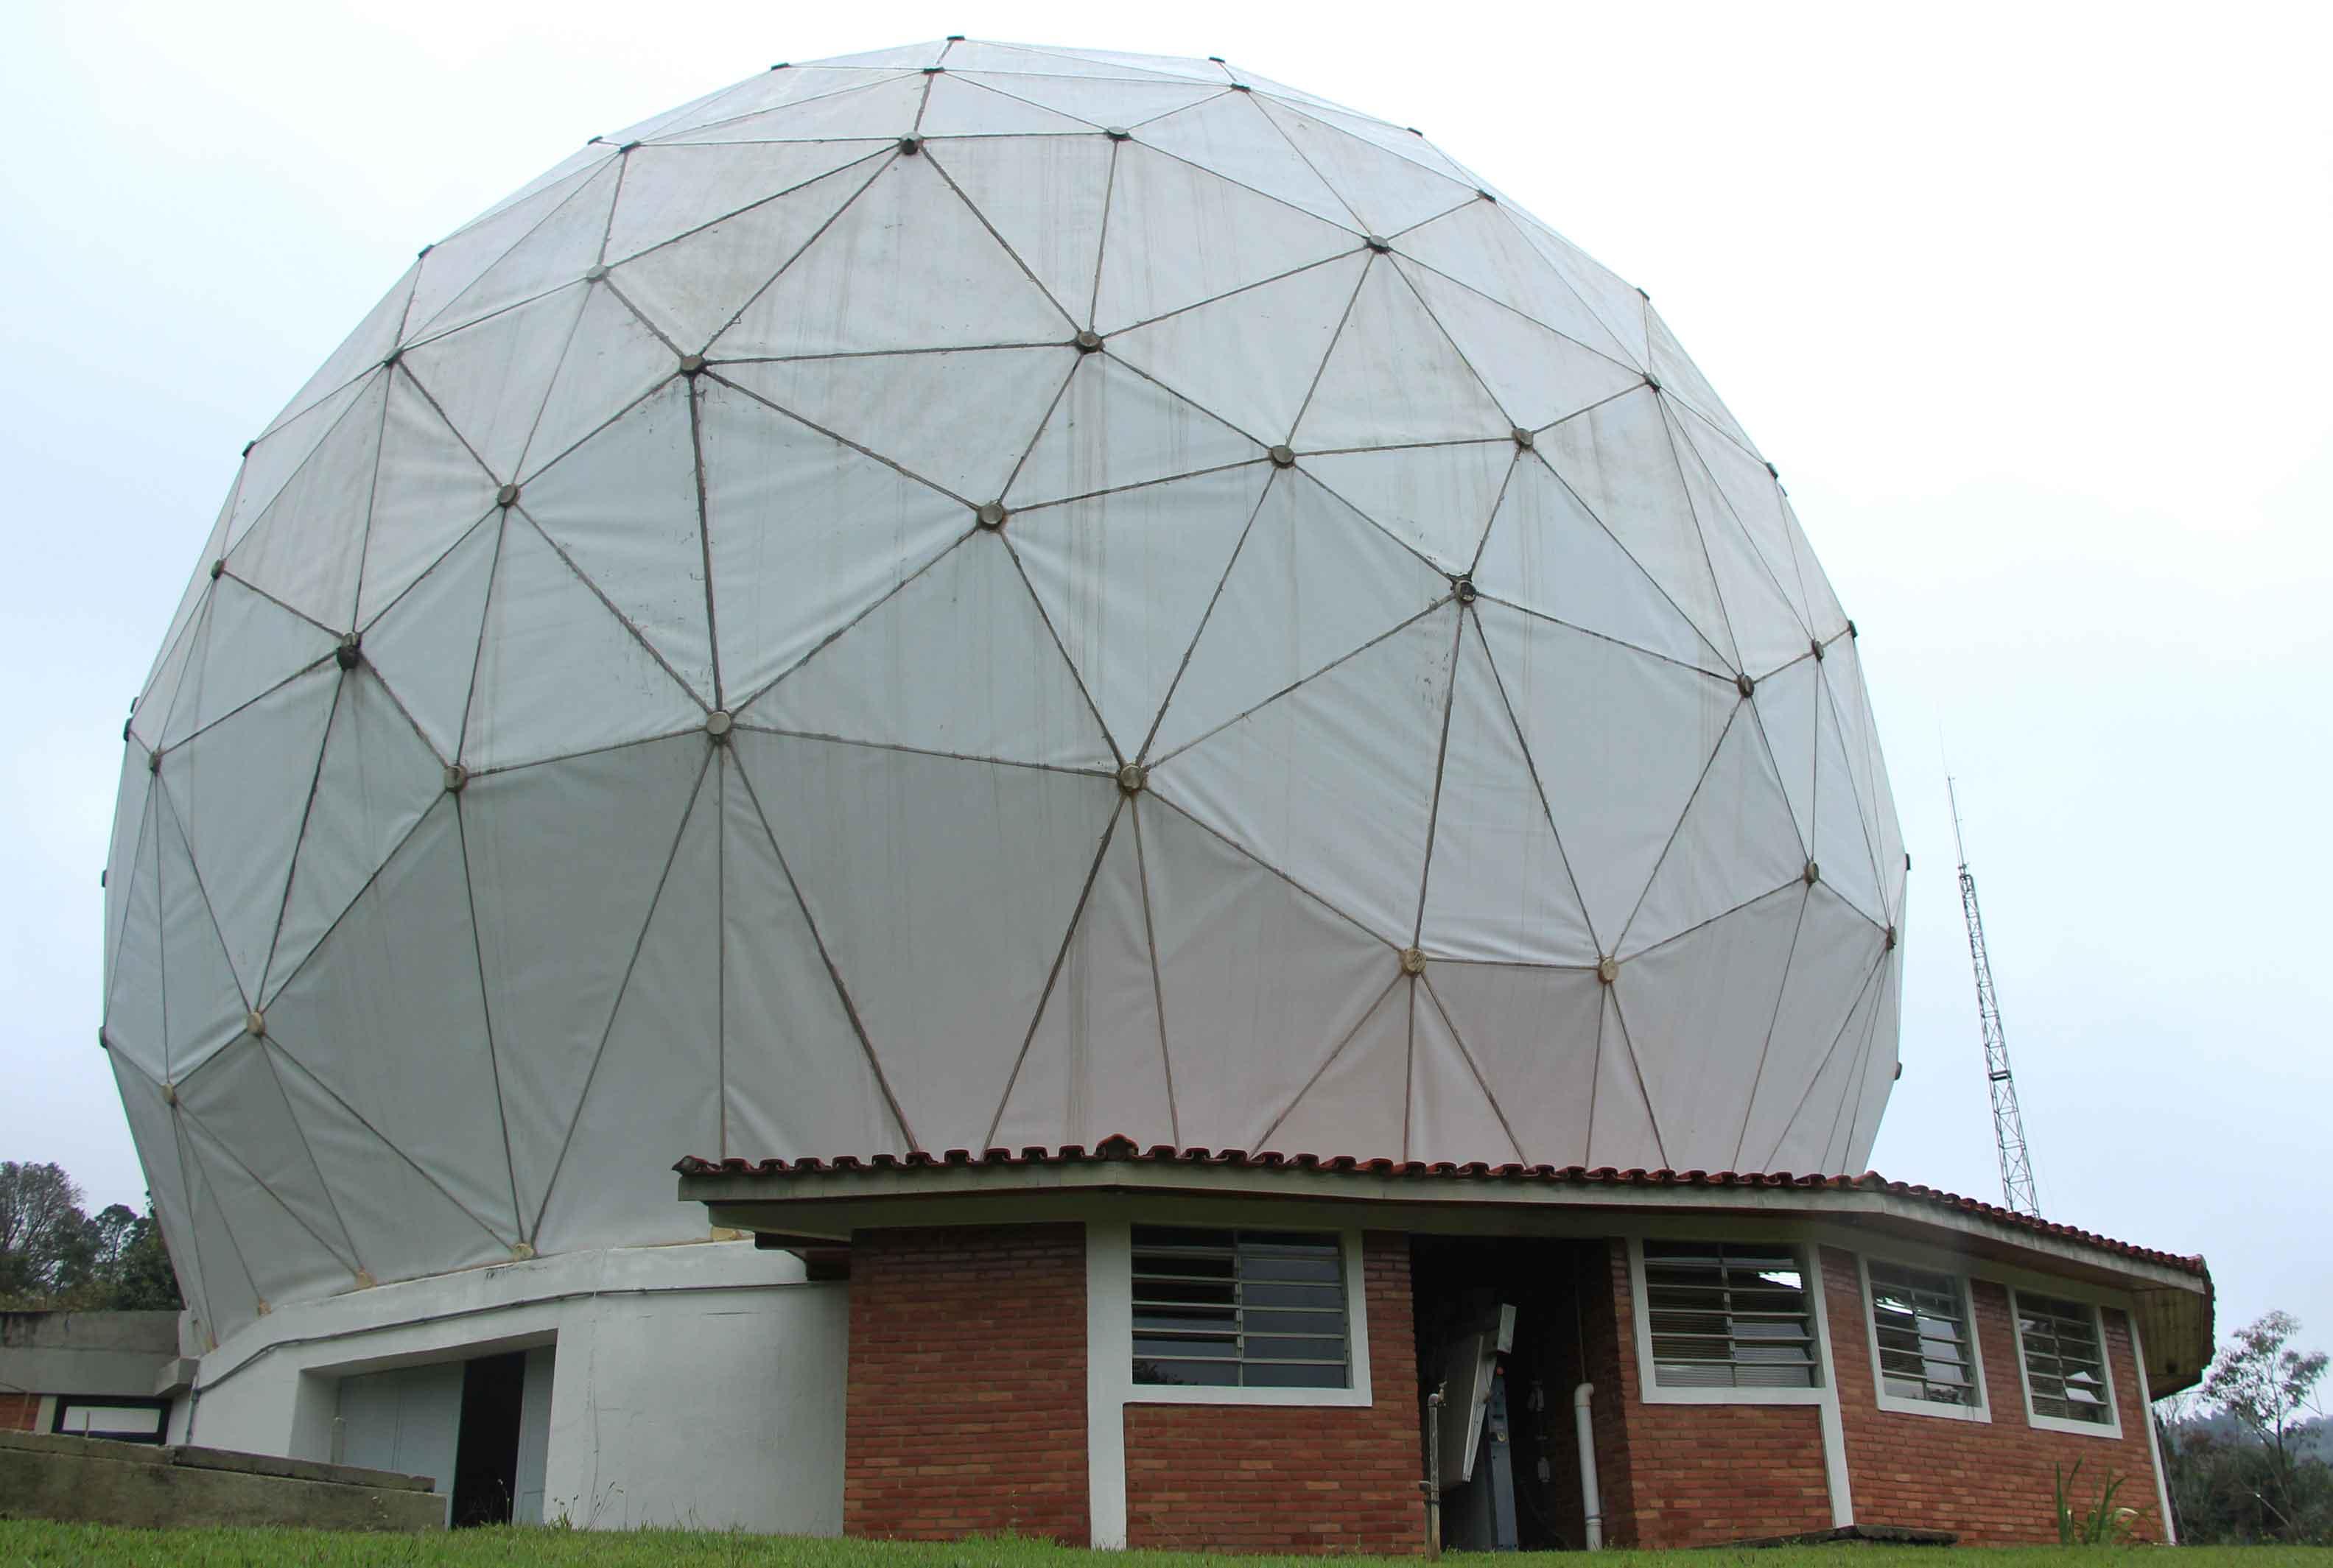 Rádio Observatório de Itapetinga-atibaia-turismo-observatorio-radiostronomia-astrofisica-itapetinga-7266-bx